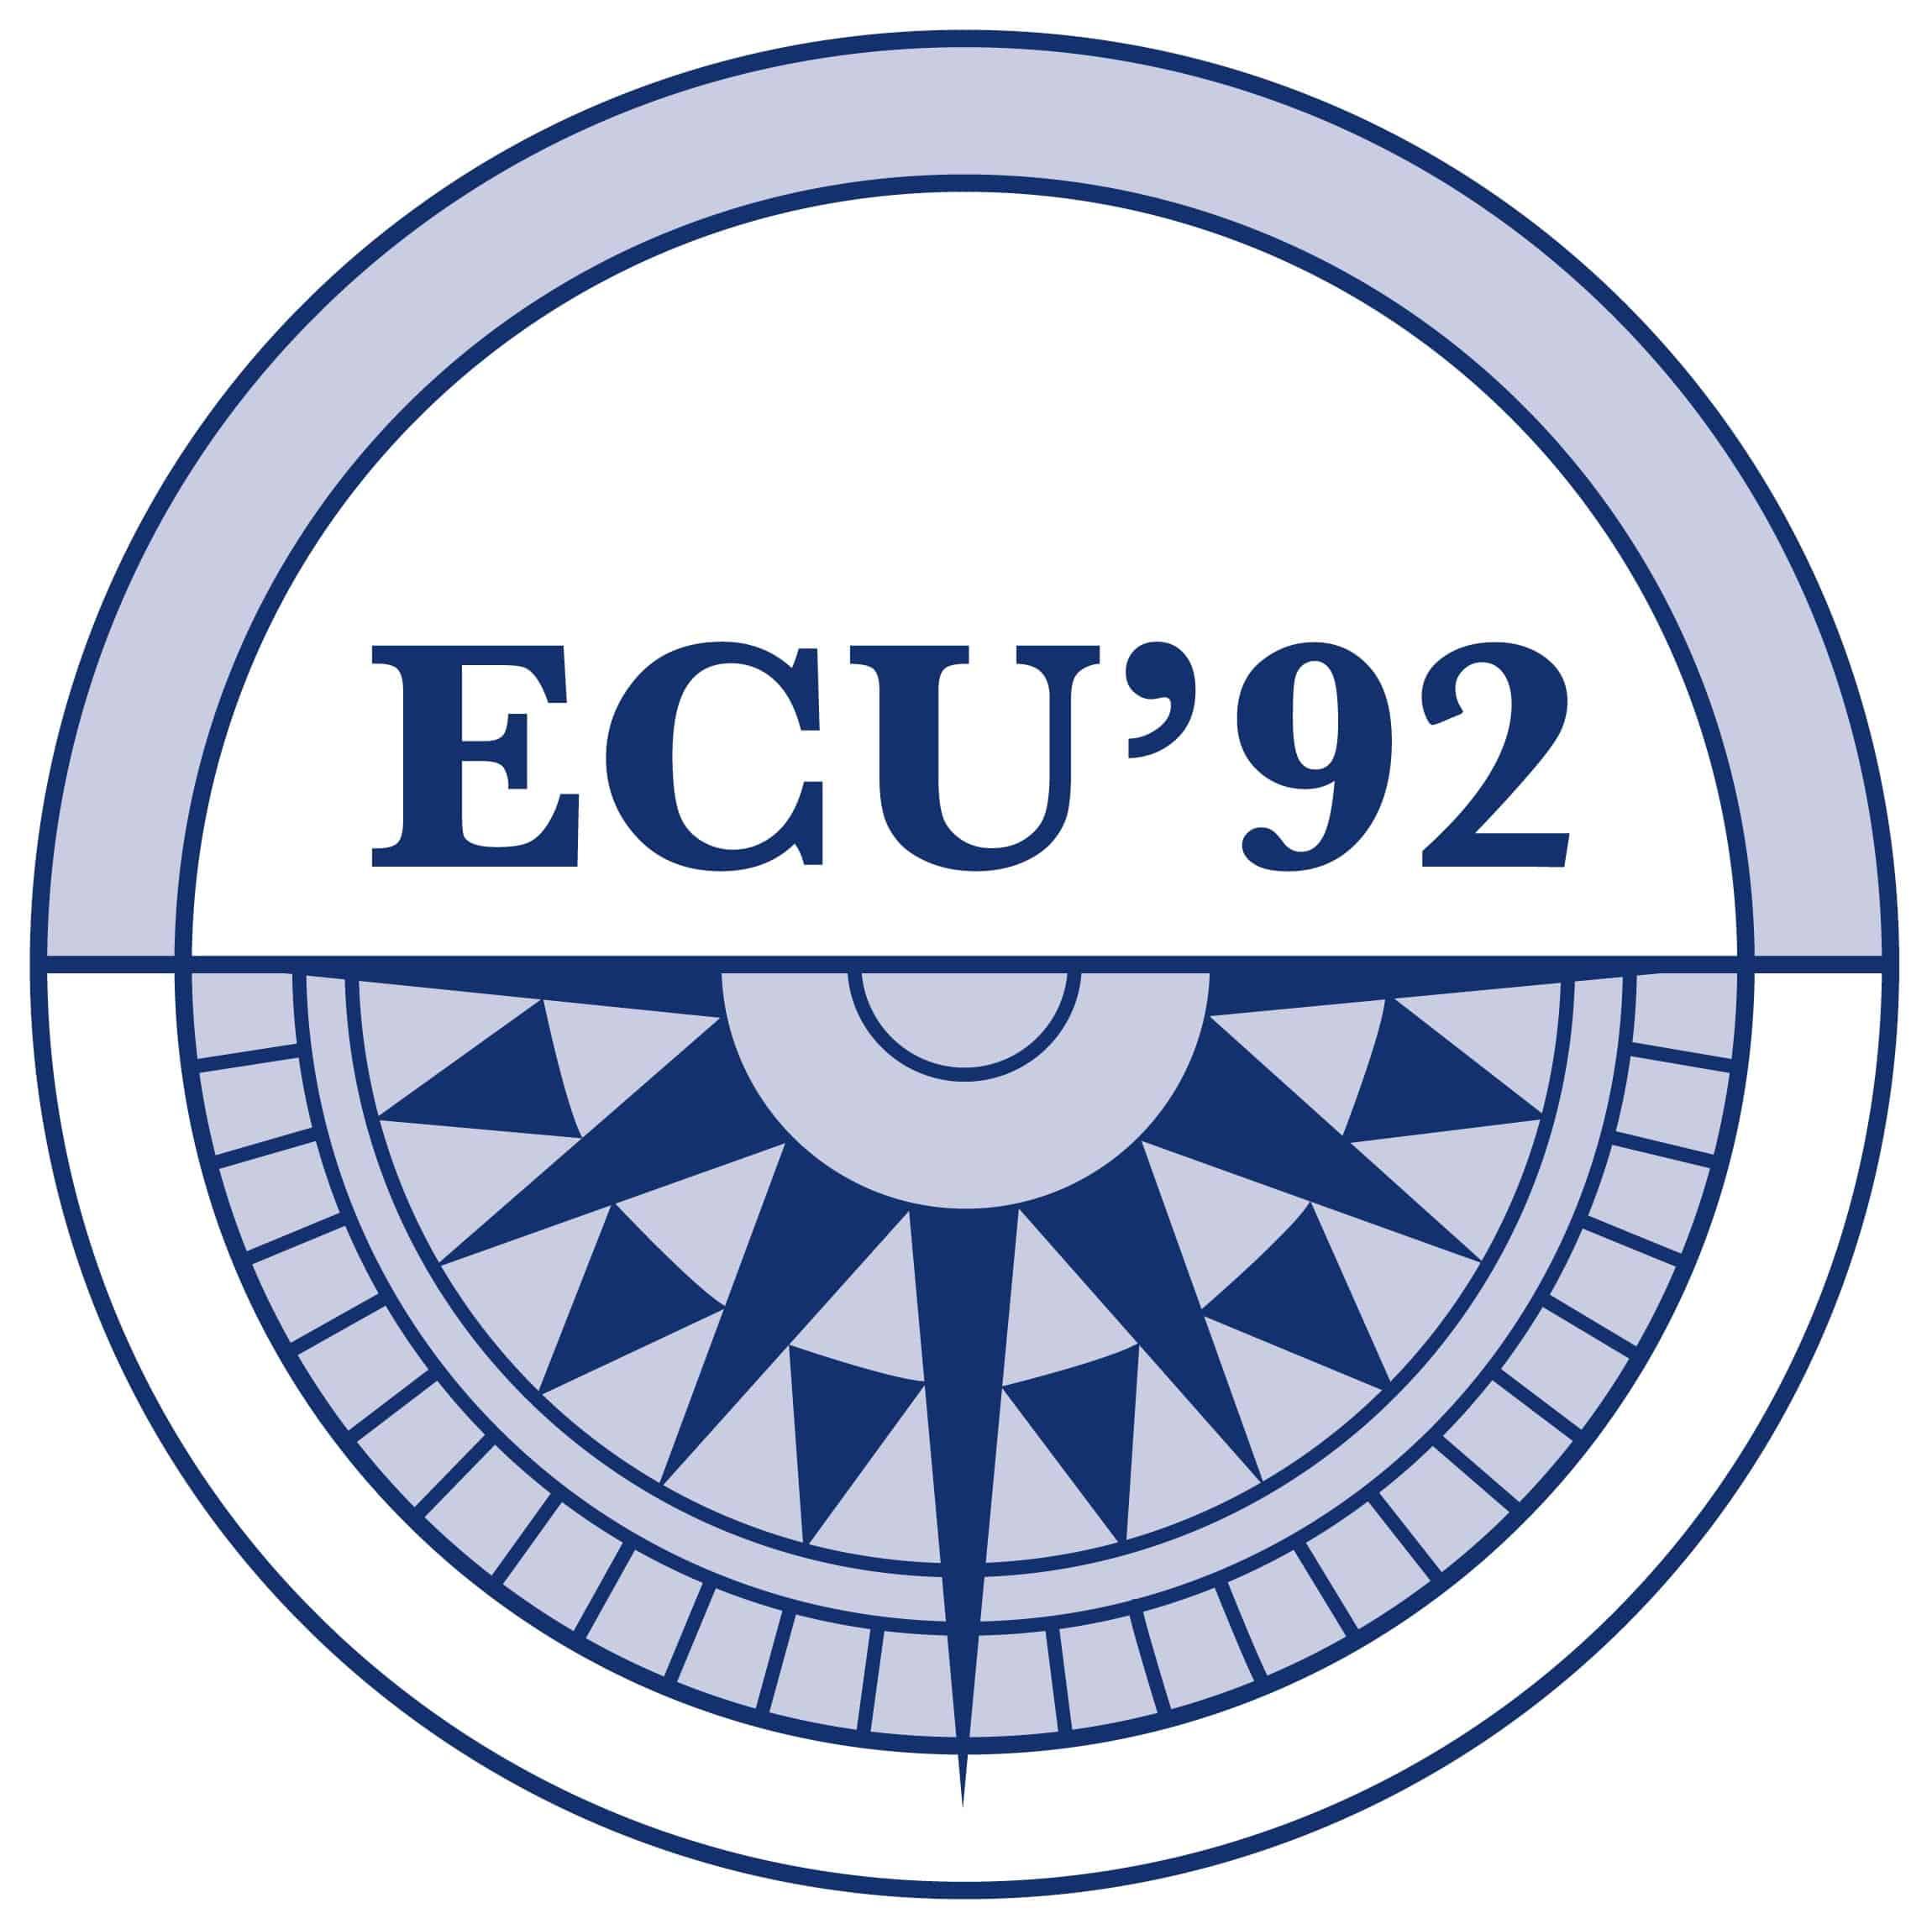 ECU'92